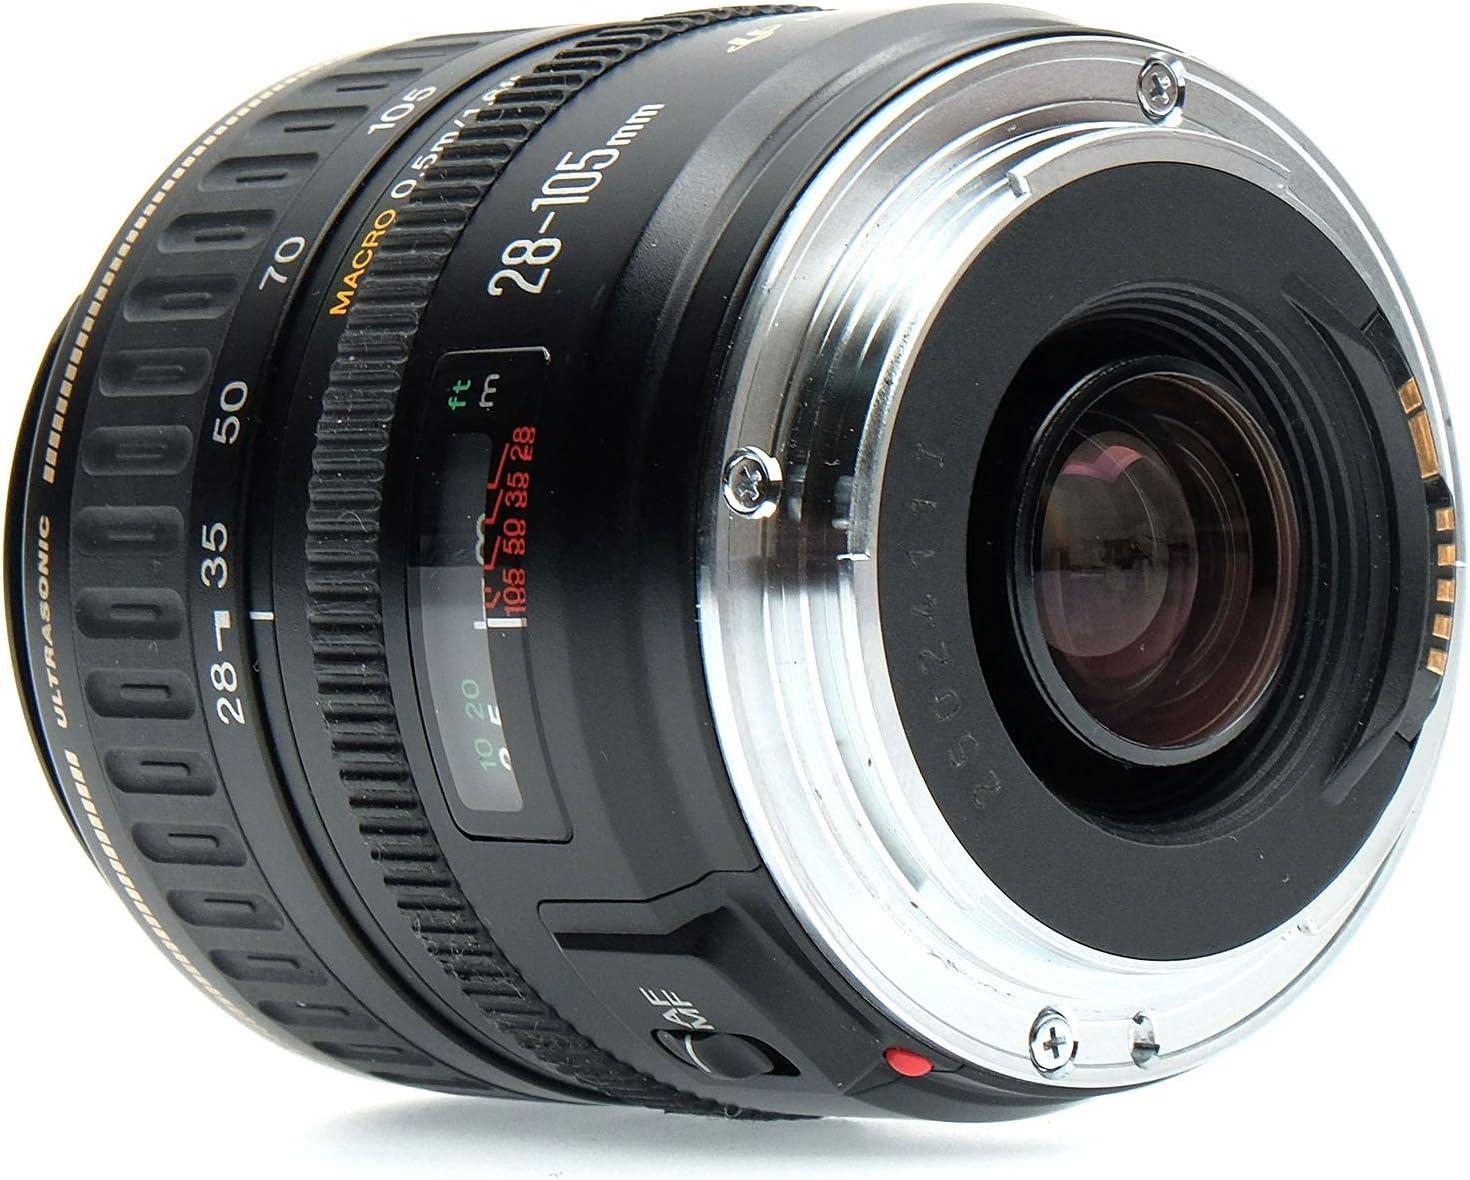 Canon Ef 28 105 Mm F3 5 4 5 Usm Standard Zoom Lens Camera Photo